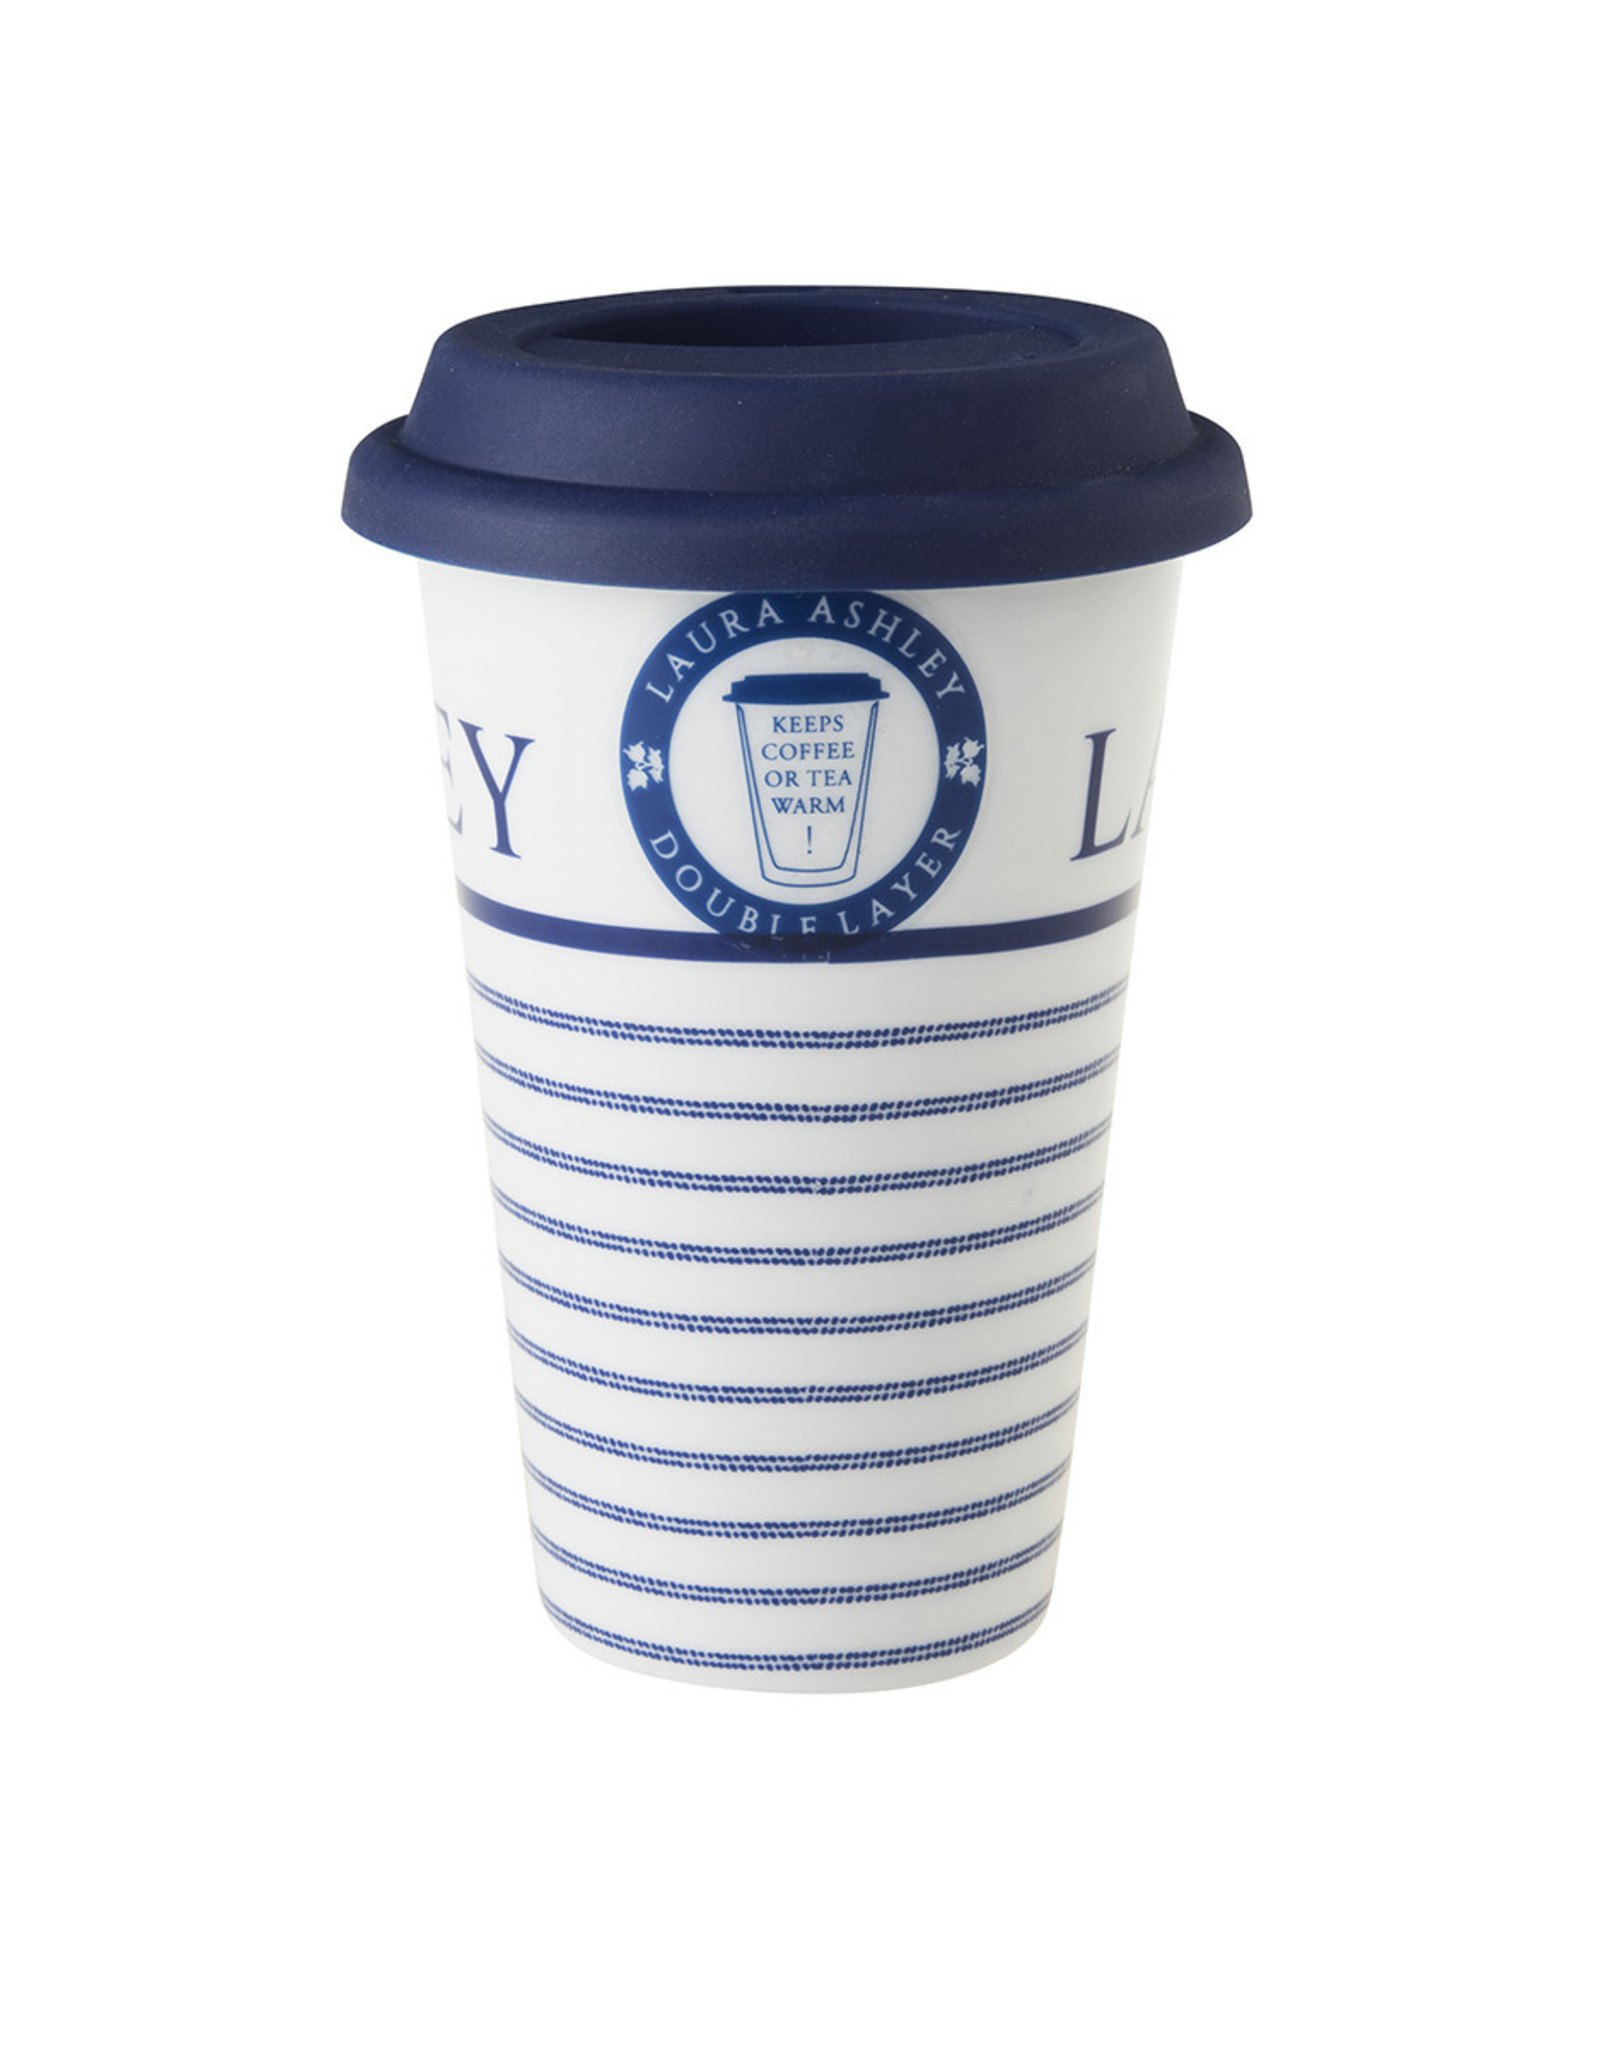 Laura Ashley Coffee to go Beker Candy - Laura Ashley